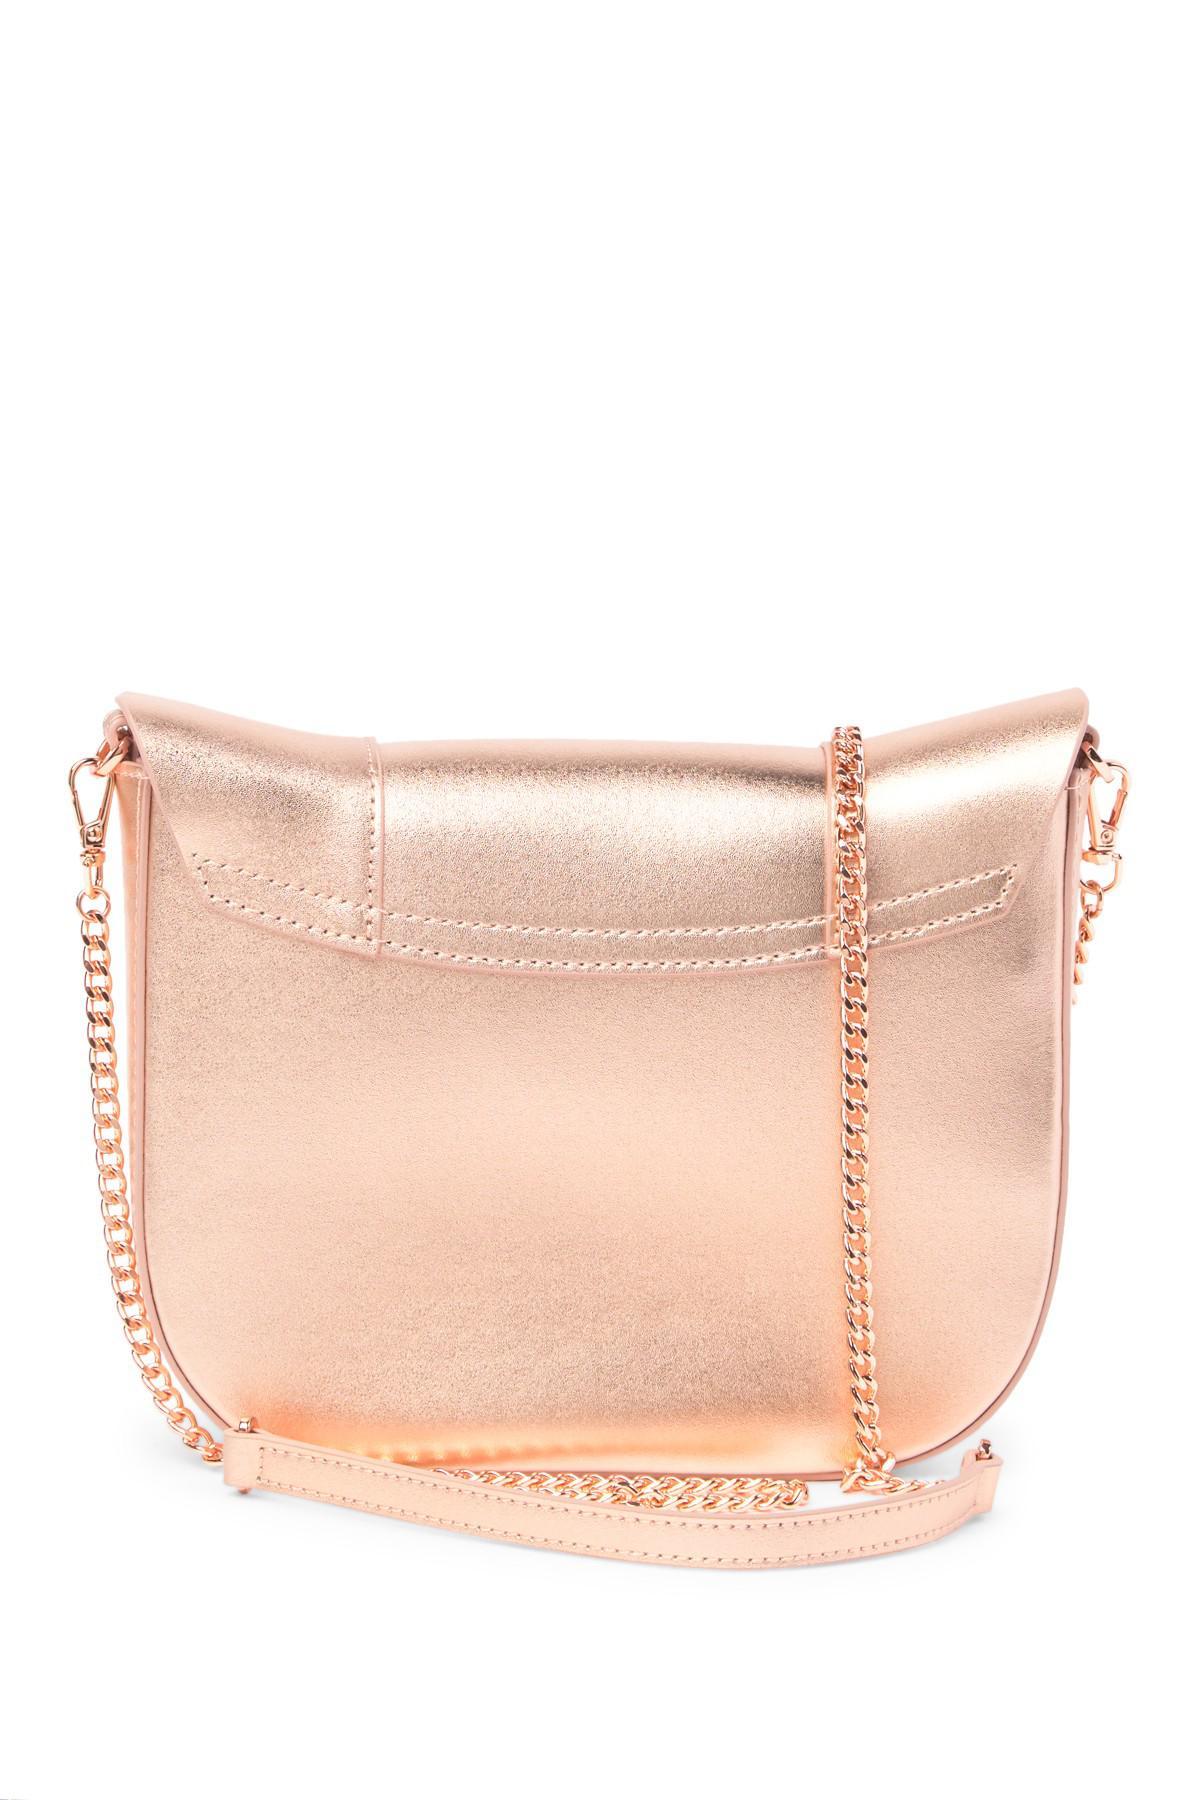 8b2a212ebd Lyst - Ted Baker Barkley Dog Leather Crossbody Bag in Pink